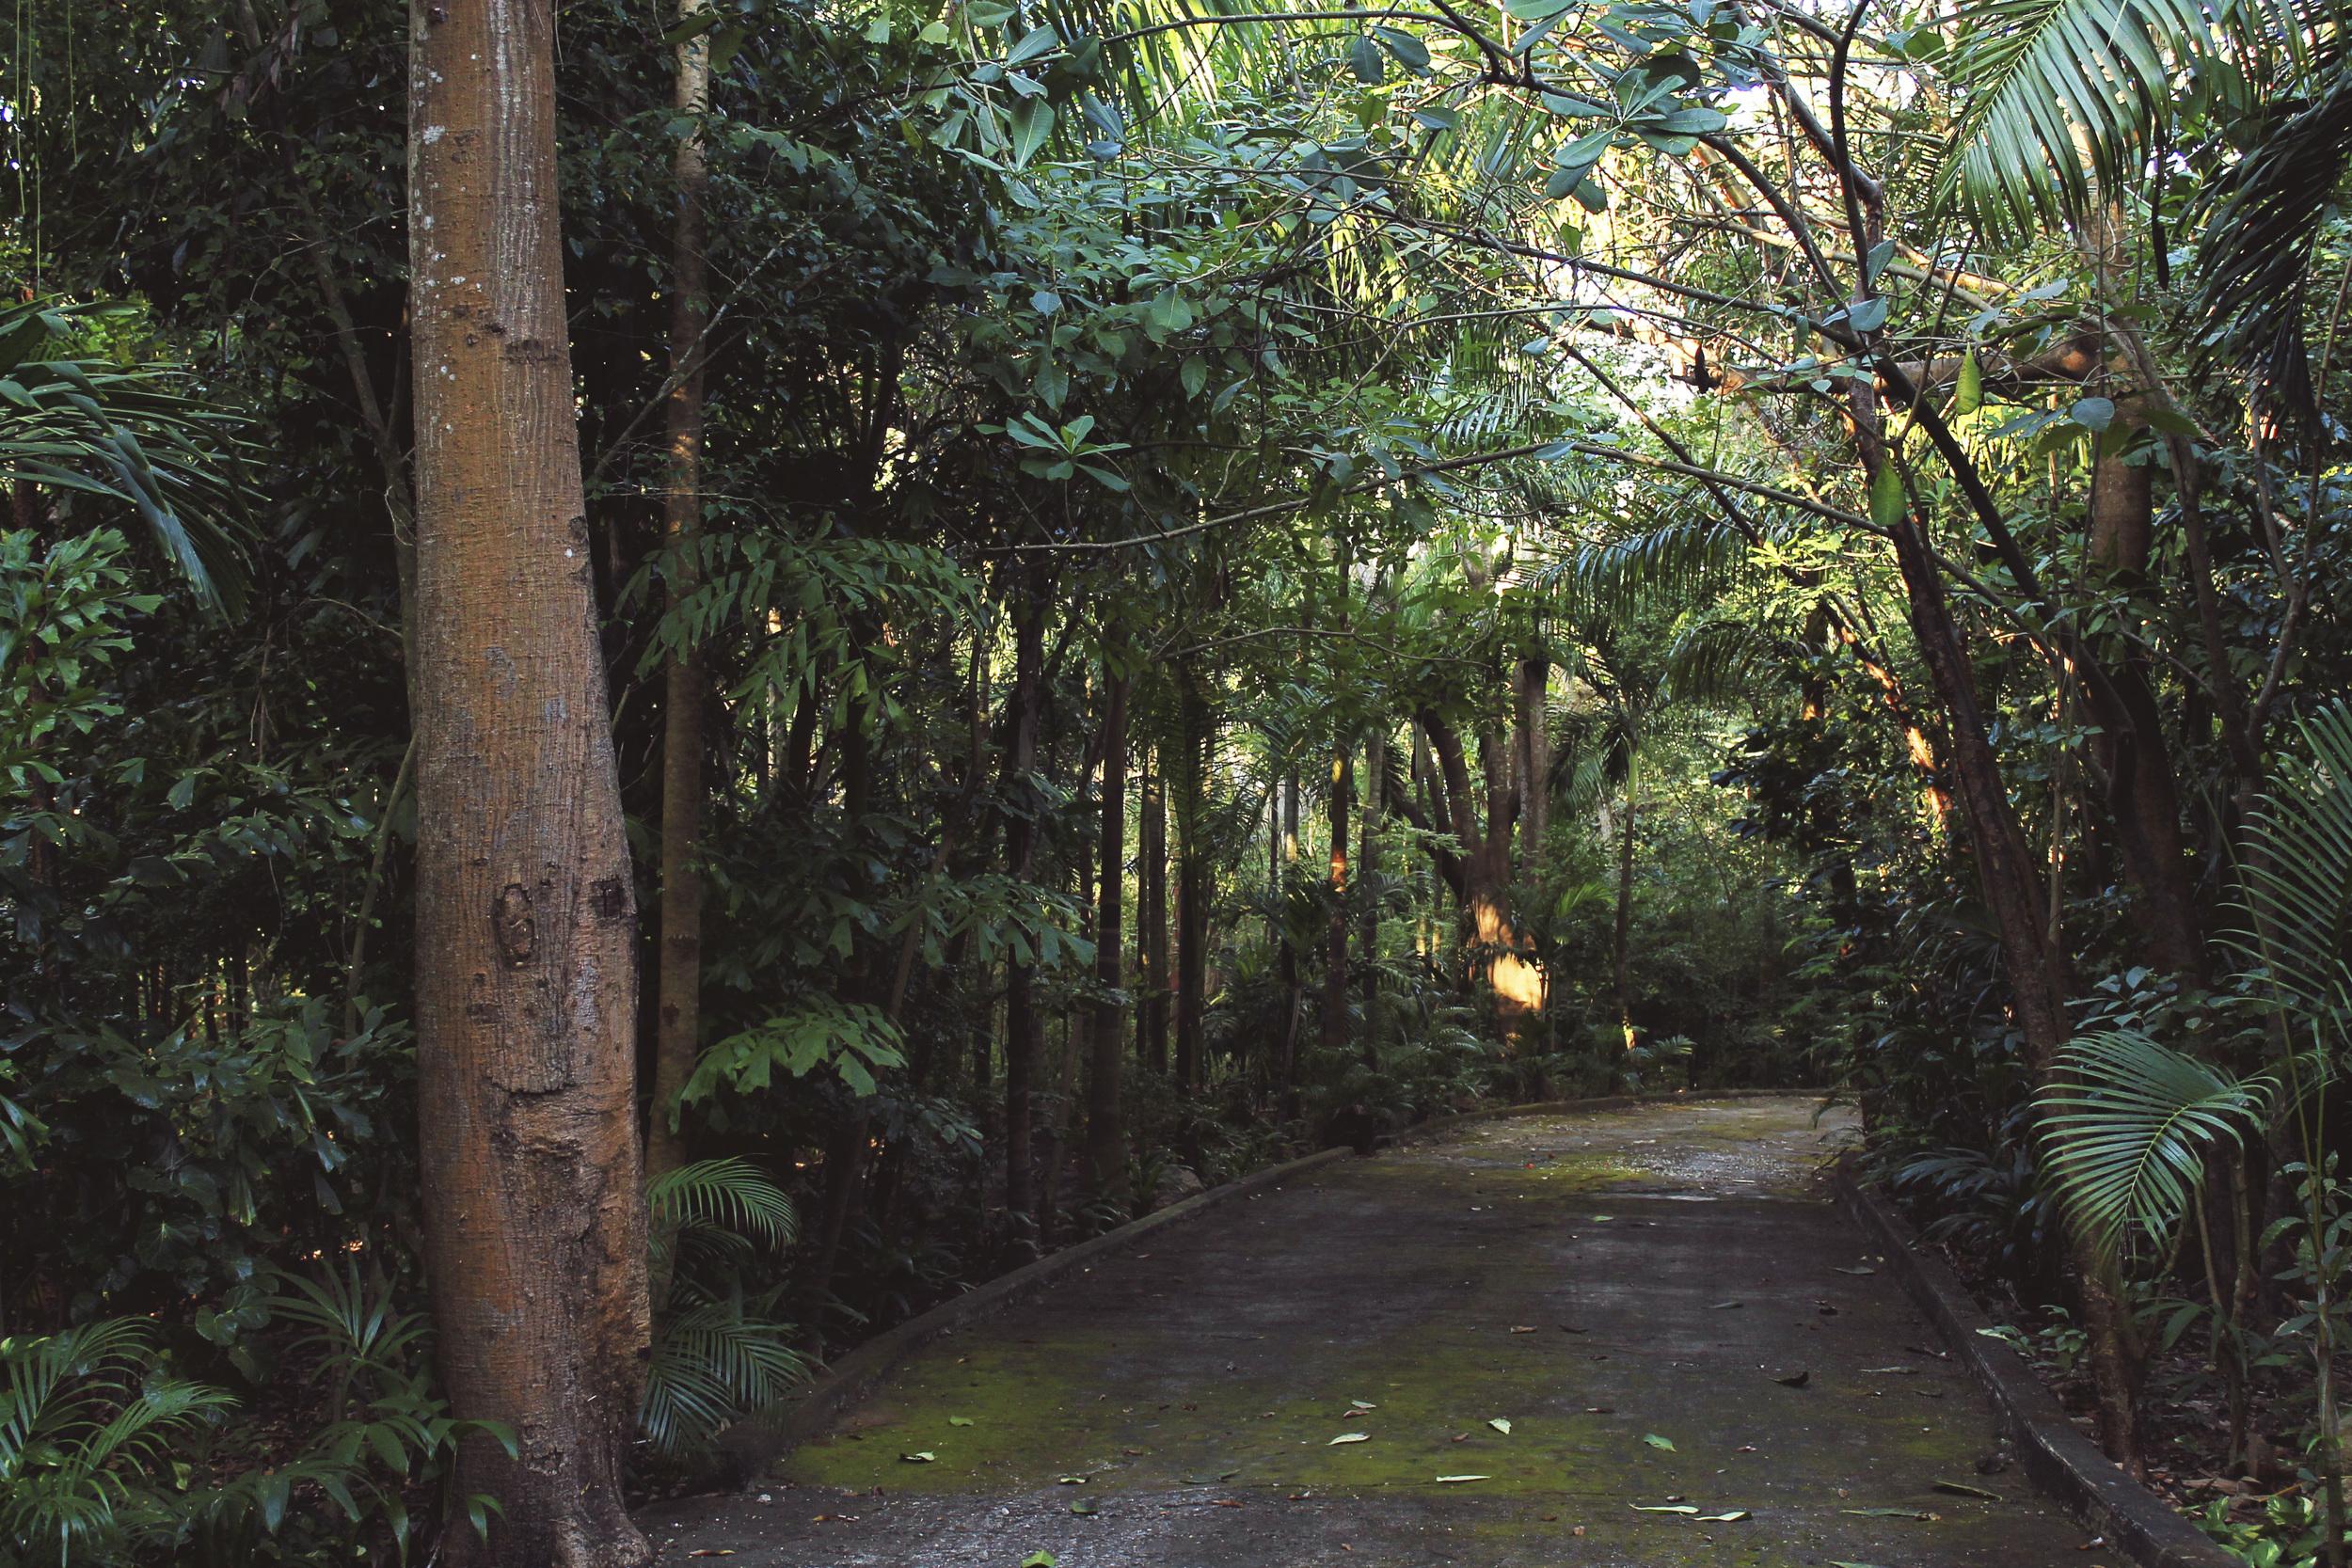 mexico ixtapa jungle road tropical